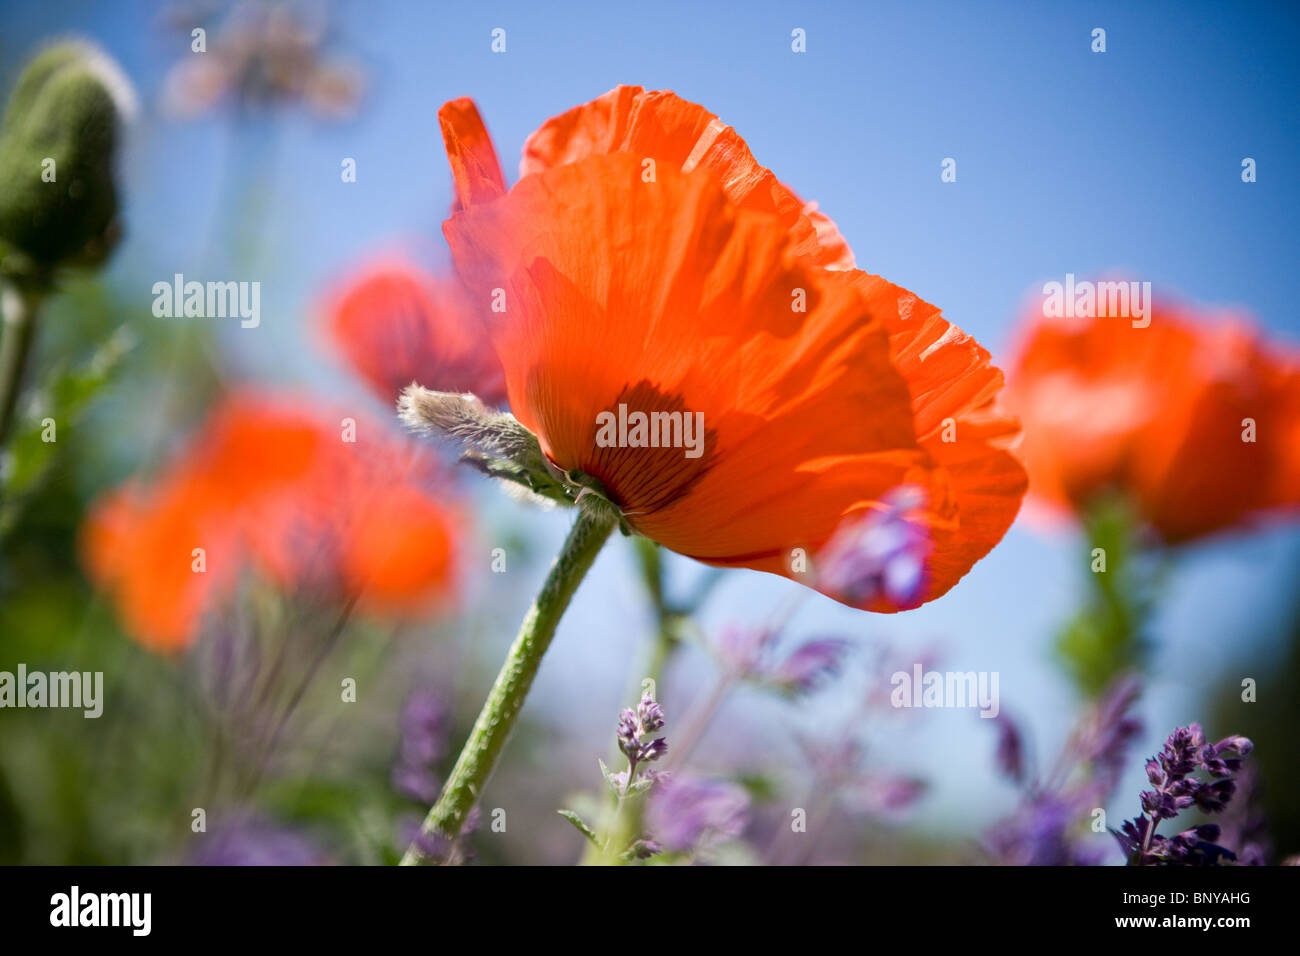 A red oriental poppy flower amongst lavender - Stock Image